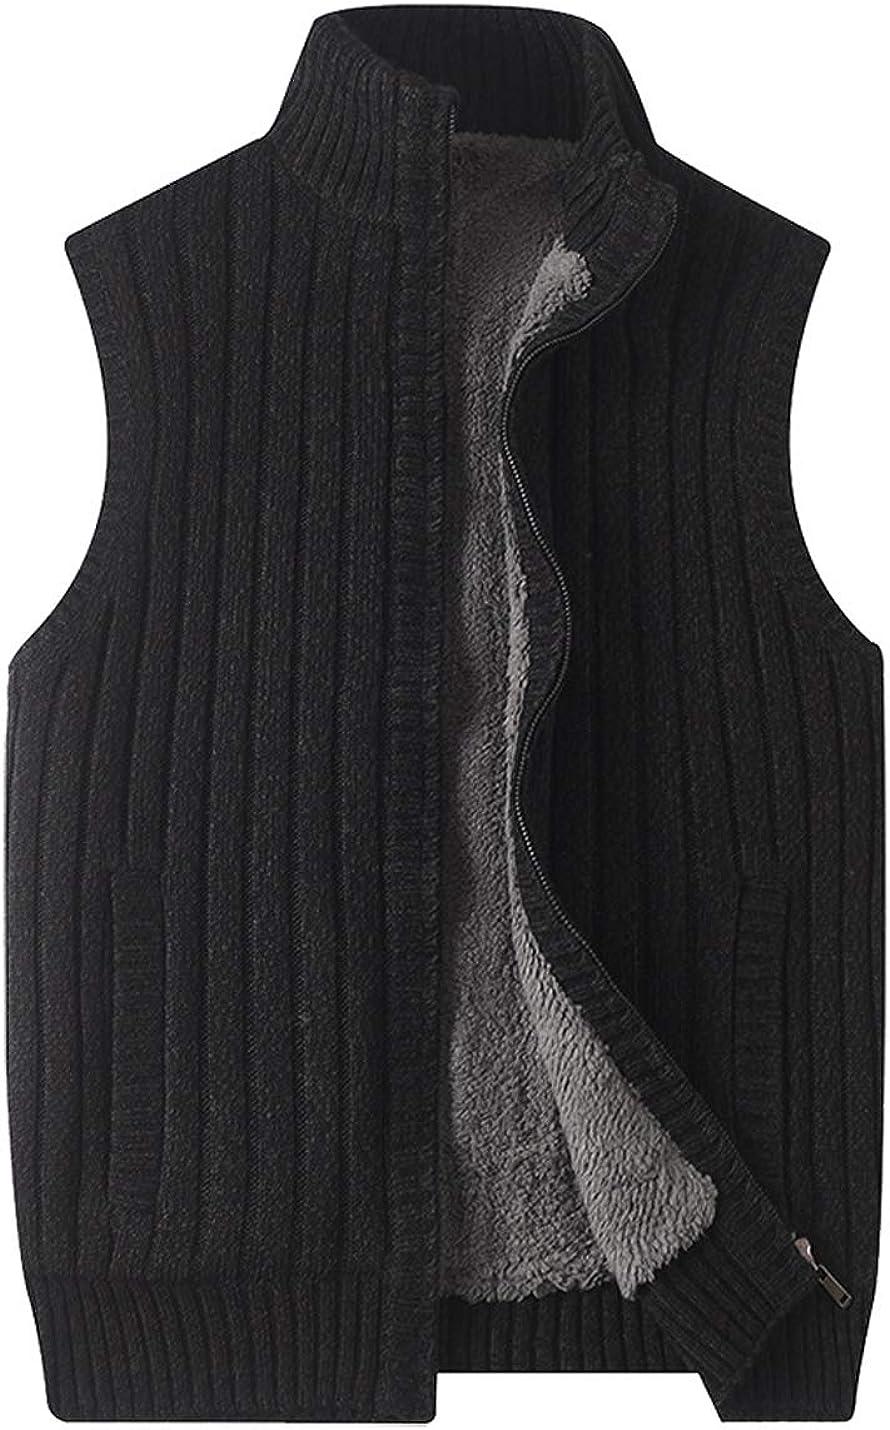 Hongsui Men's Clearance SALE! Limited time! V-Neck Sweater Vest Knit Loose-Fitt Blend Cashmere Sale special price